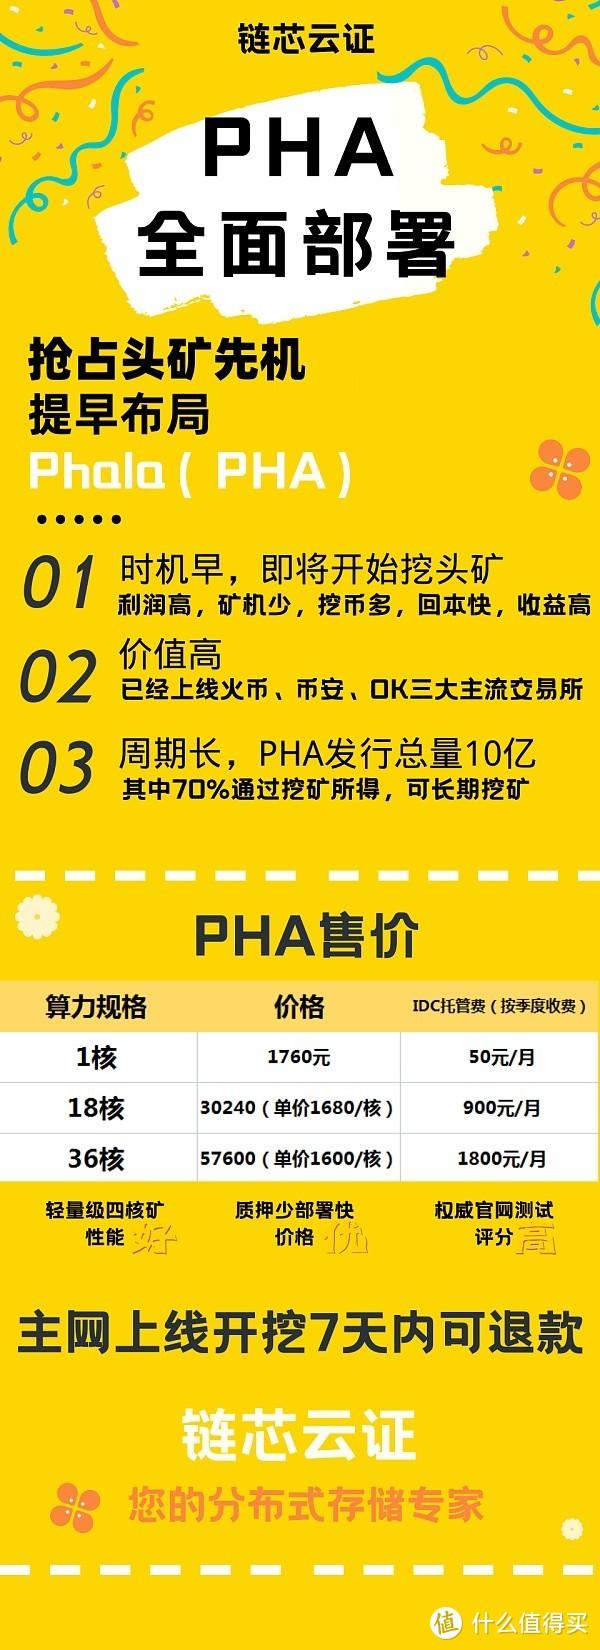 Phala是什么?PHA挖矿怎么进行?一文带你了解PHA矿机怎么部署